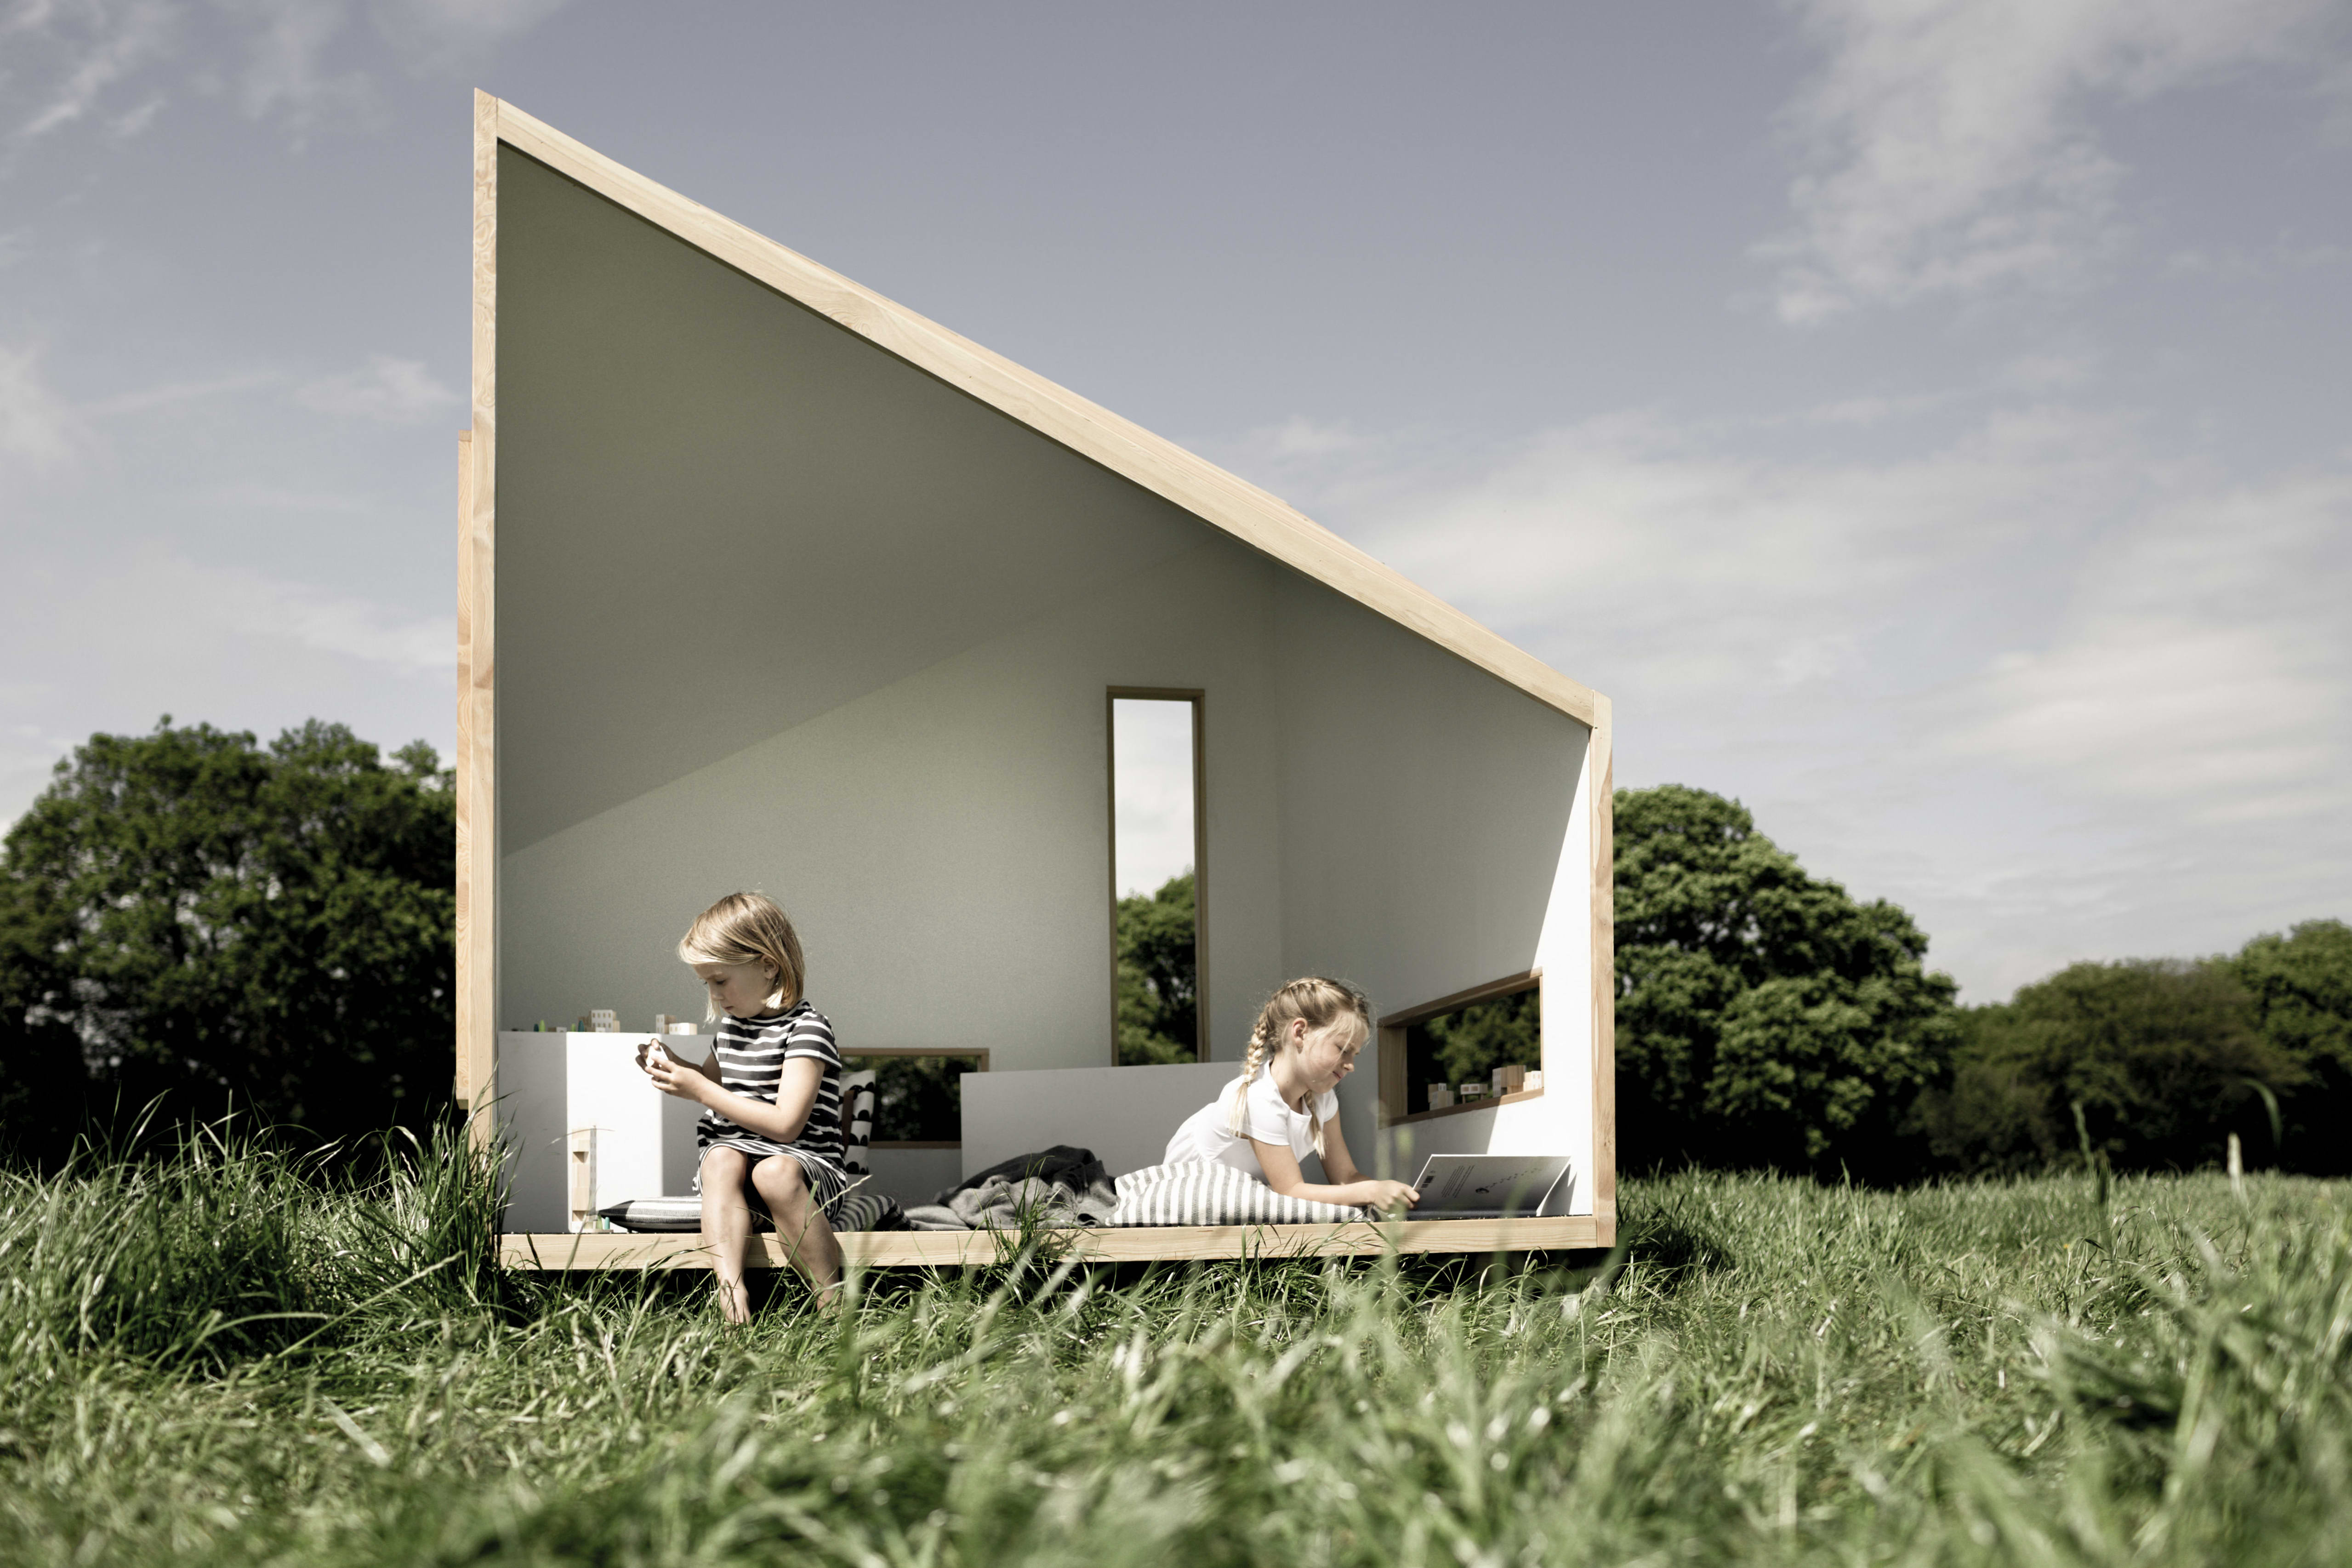 Tiny House Scandinavian Playhouse Koto   Apartment Therapy